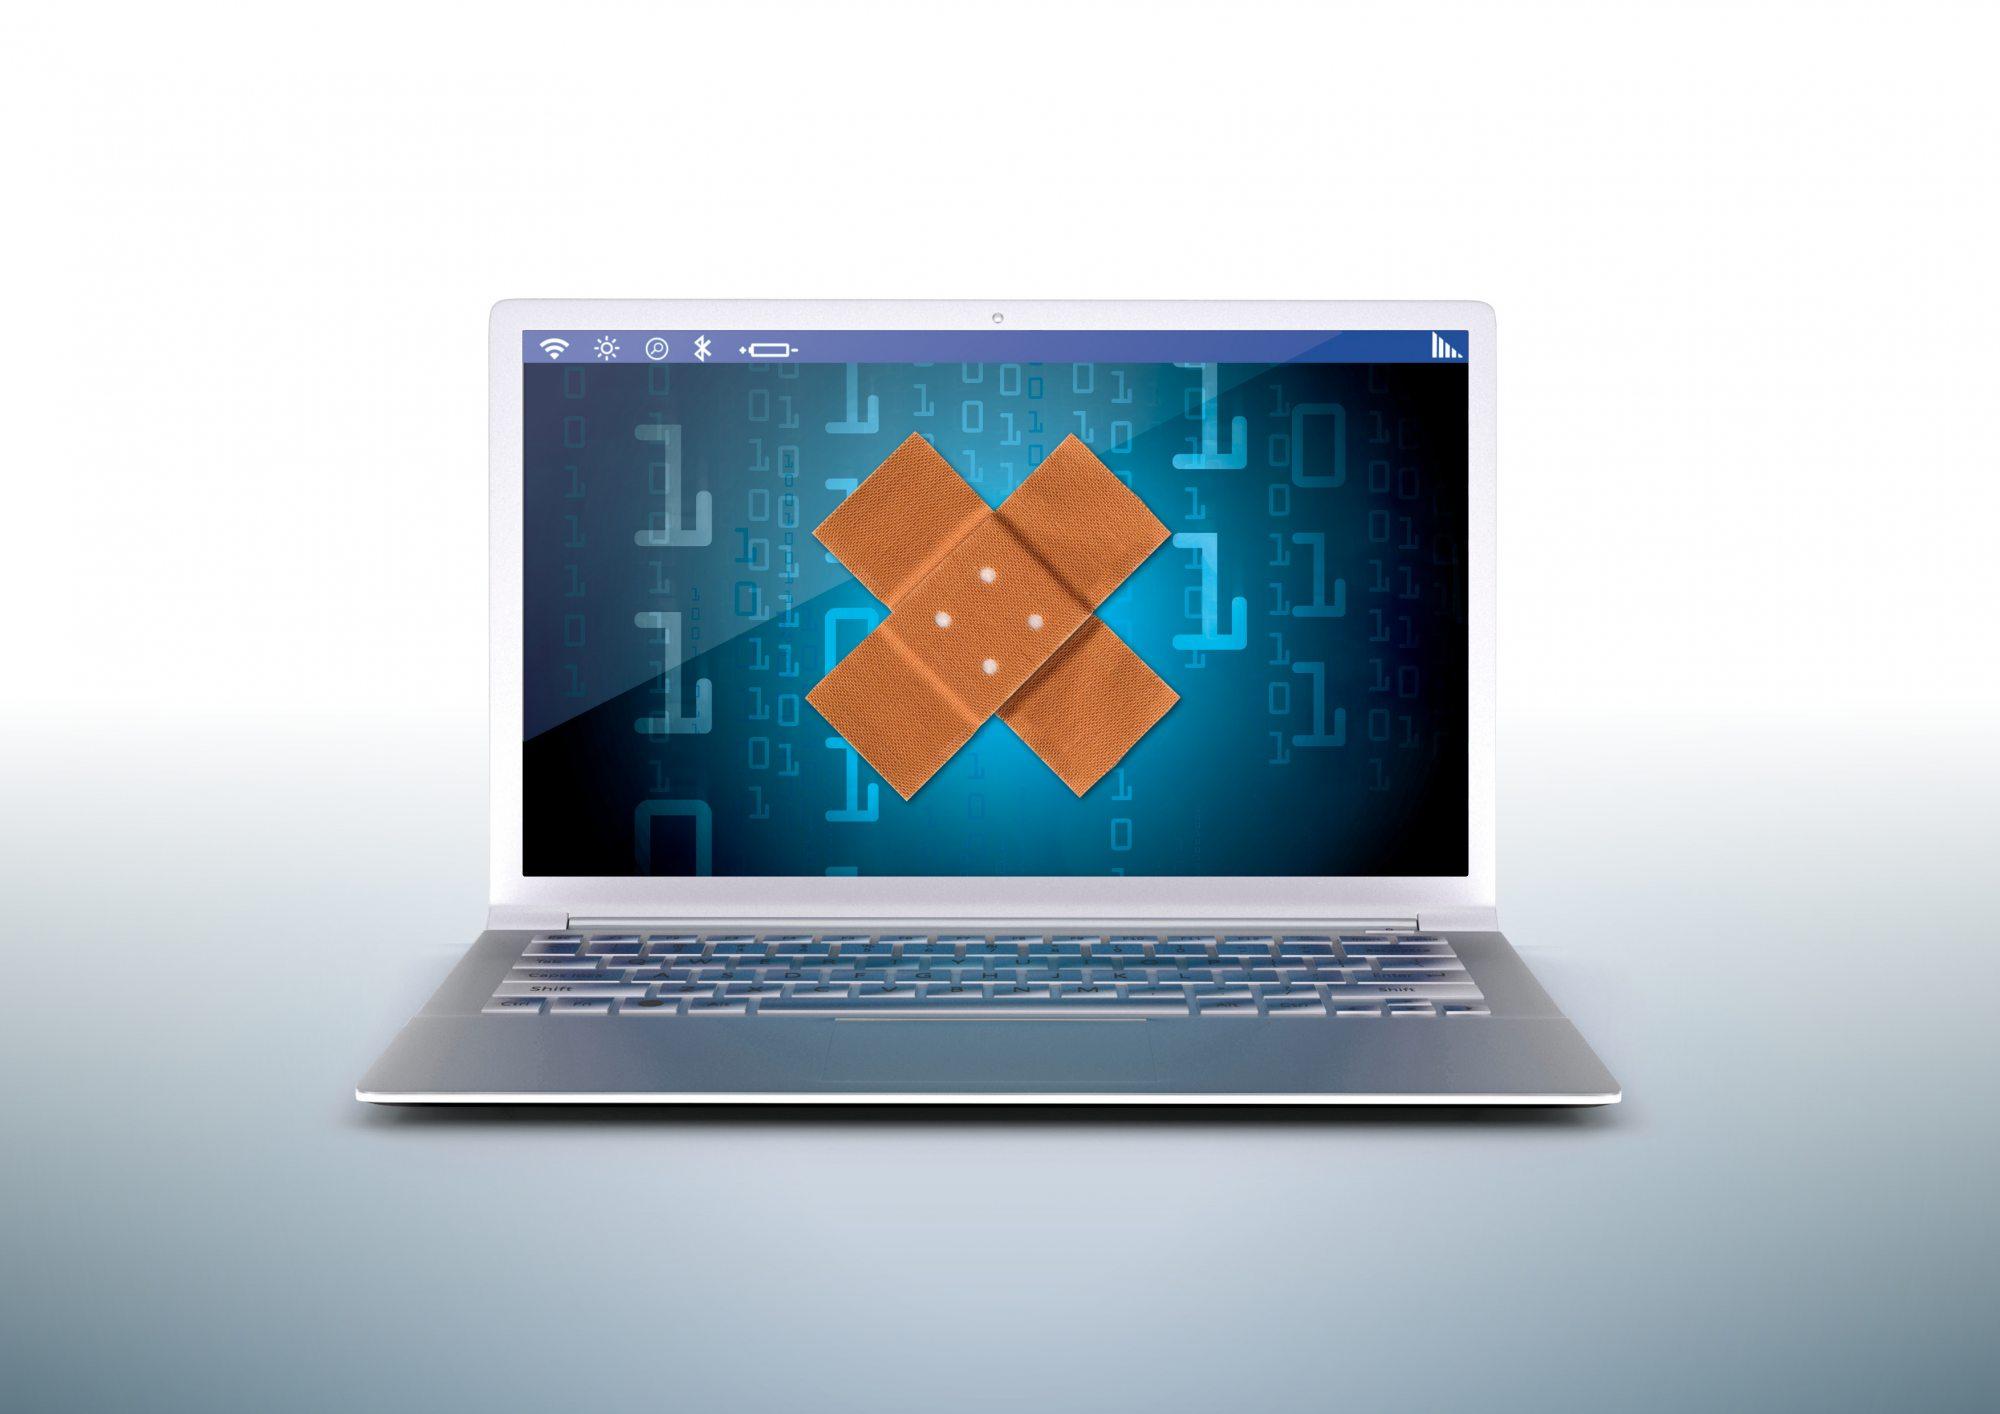 Laptop patching illustration